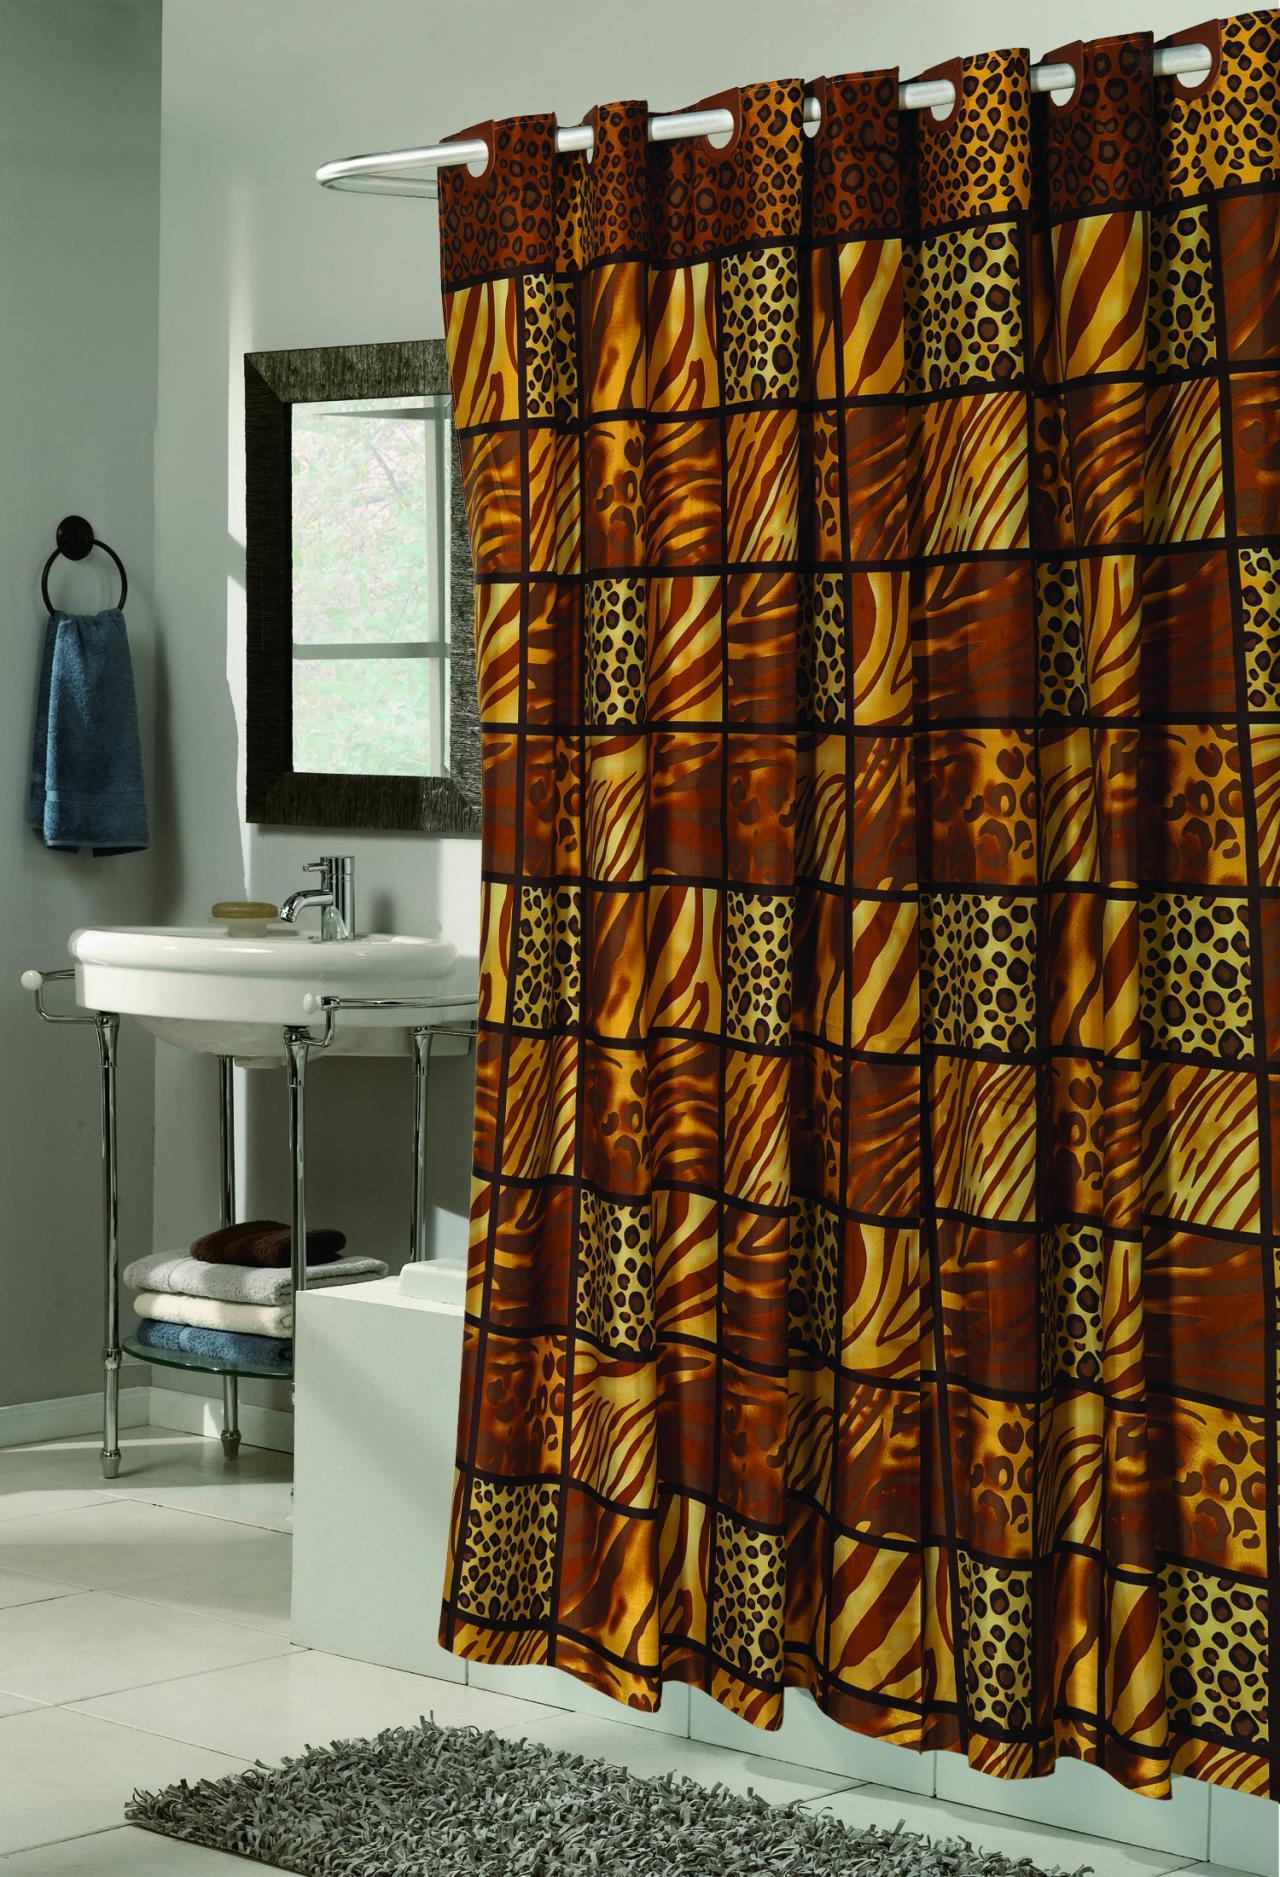 Carnation Home Fashions Inc EZ On Fabric Shower CurtainsNo Hooks Needed